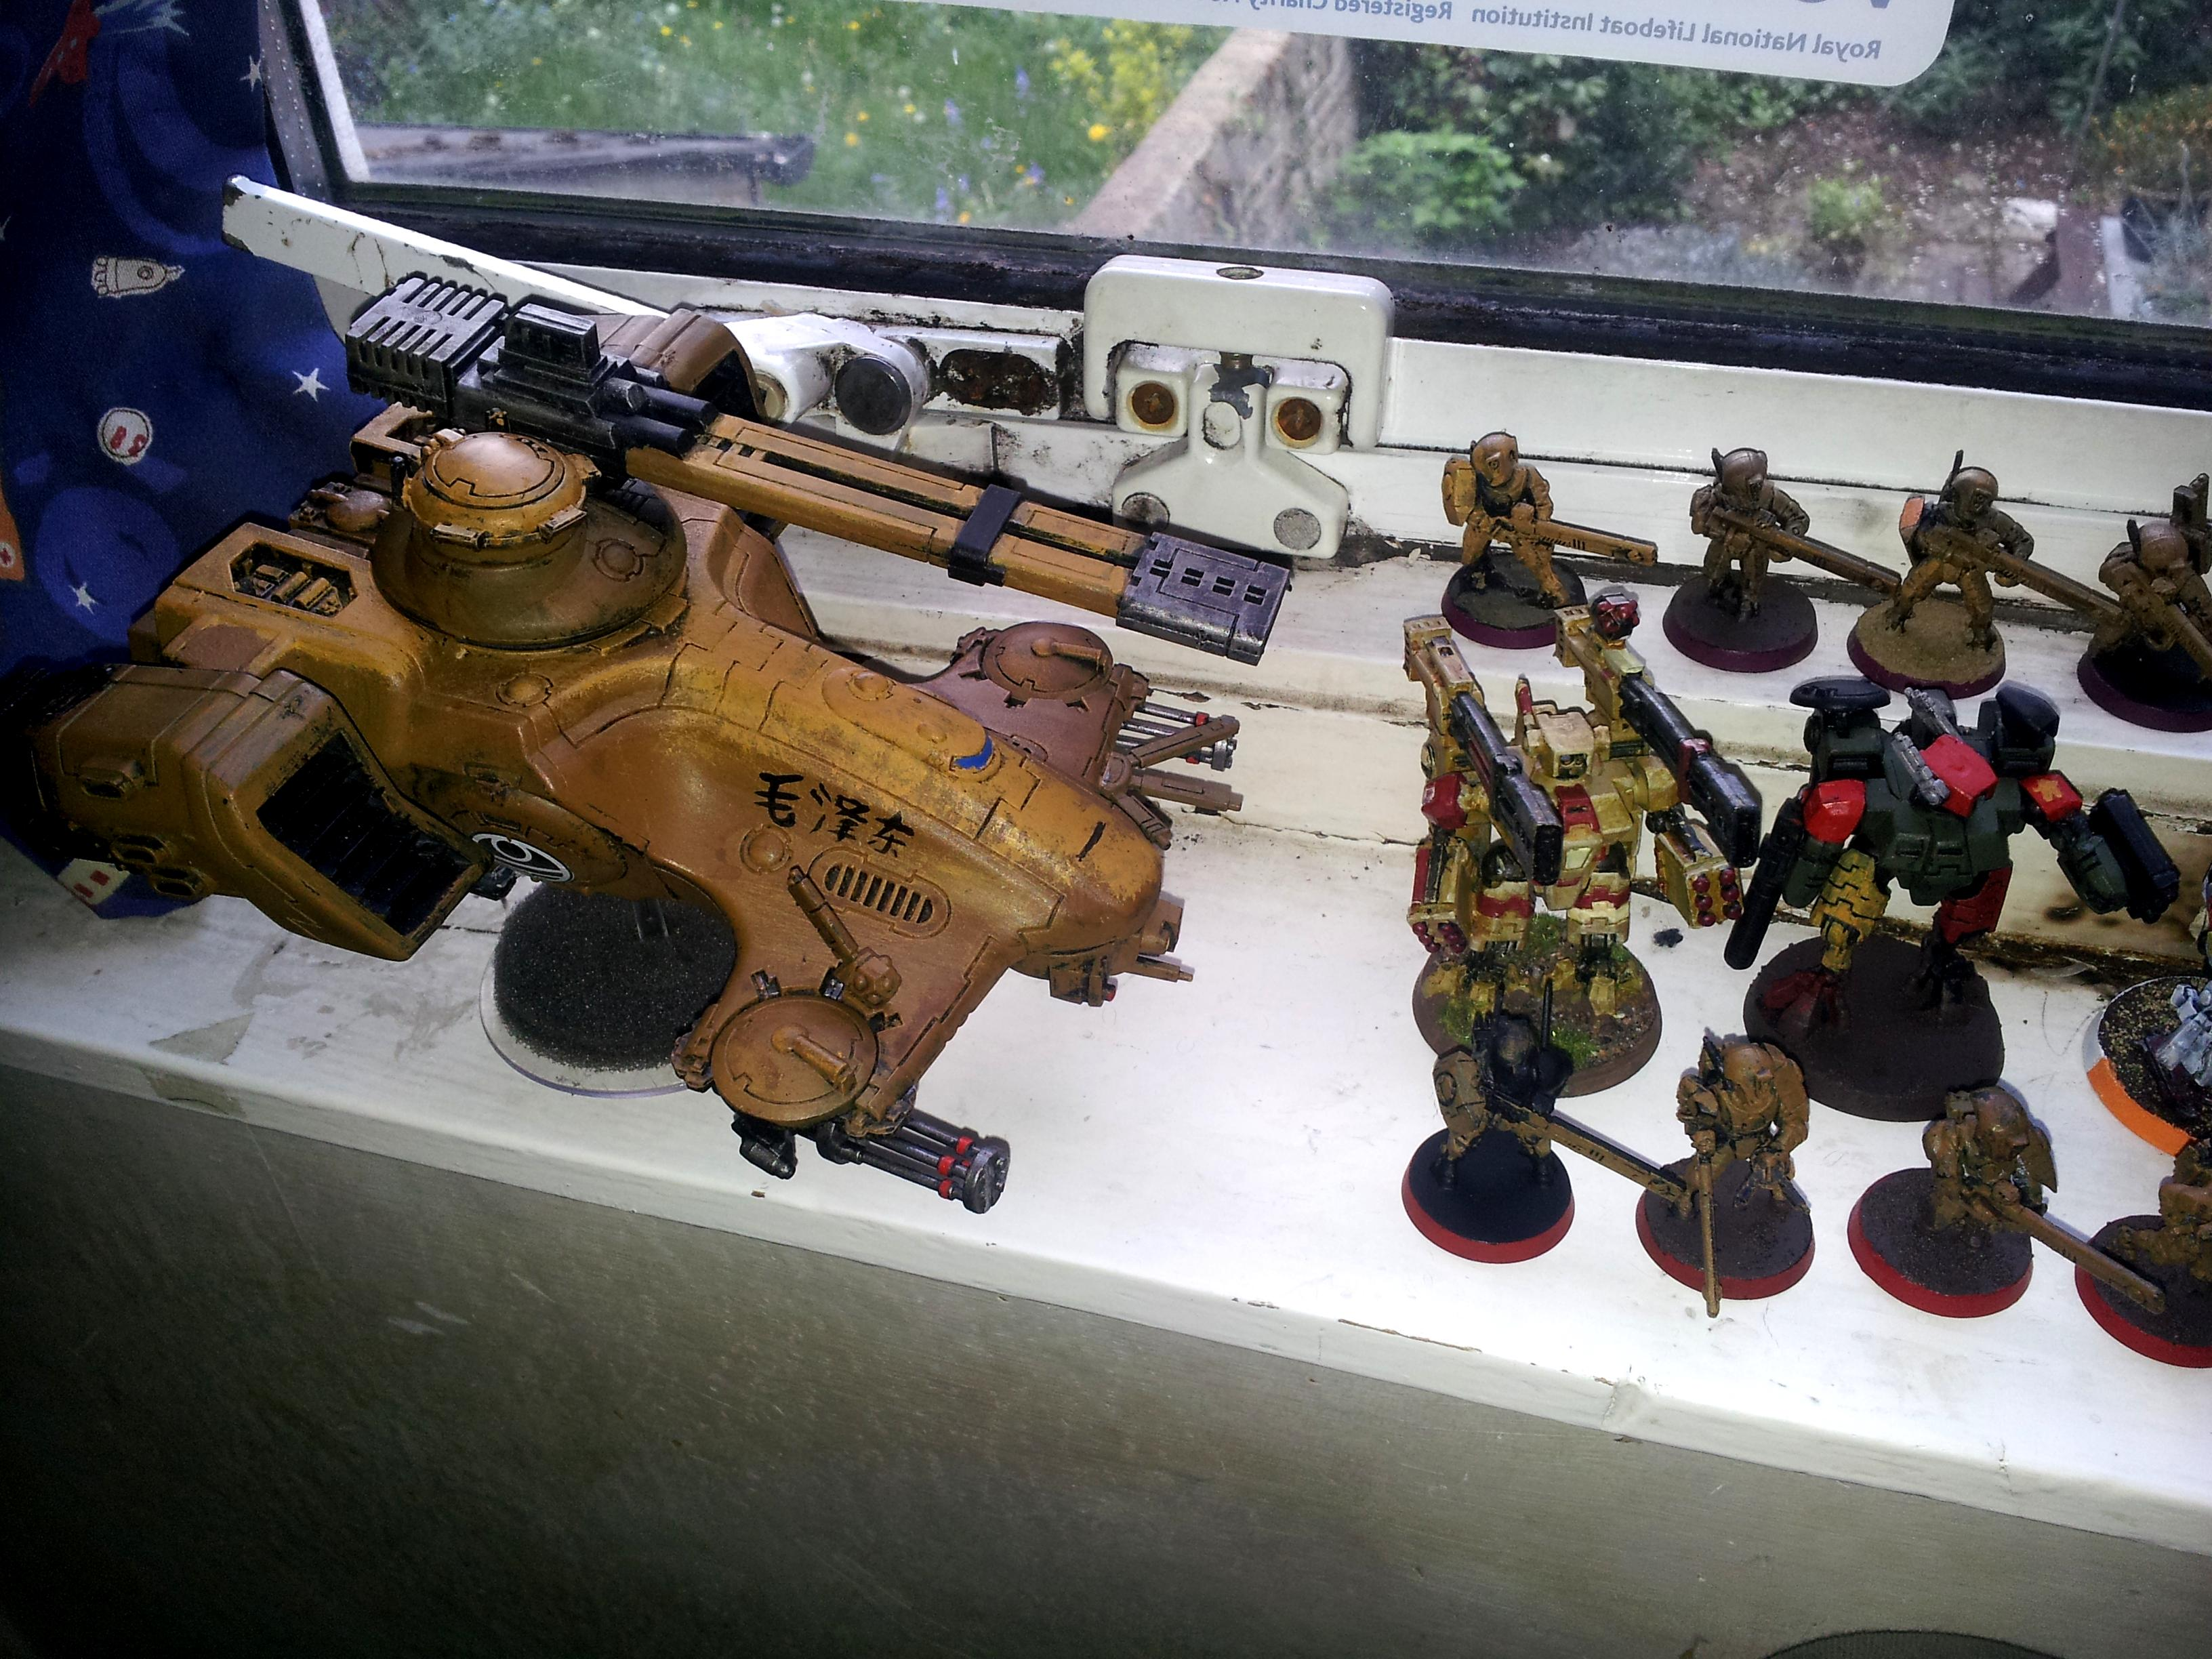 Battlesuit, Broadsides, China, Chinese, Communist, Desert, Fire Warriors, Guard, Hammerhead, Railgun, Rifle, Tau, Unfinished